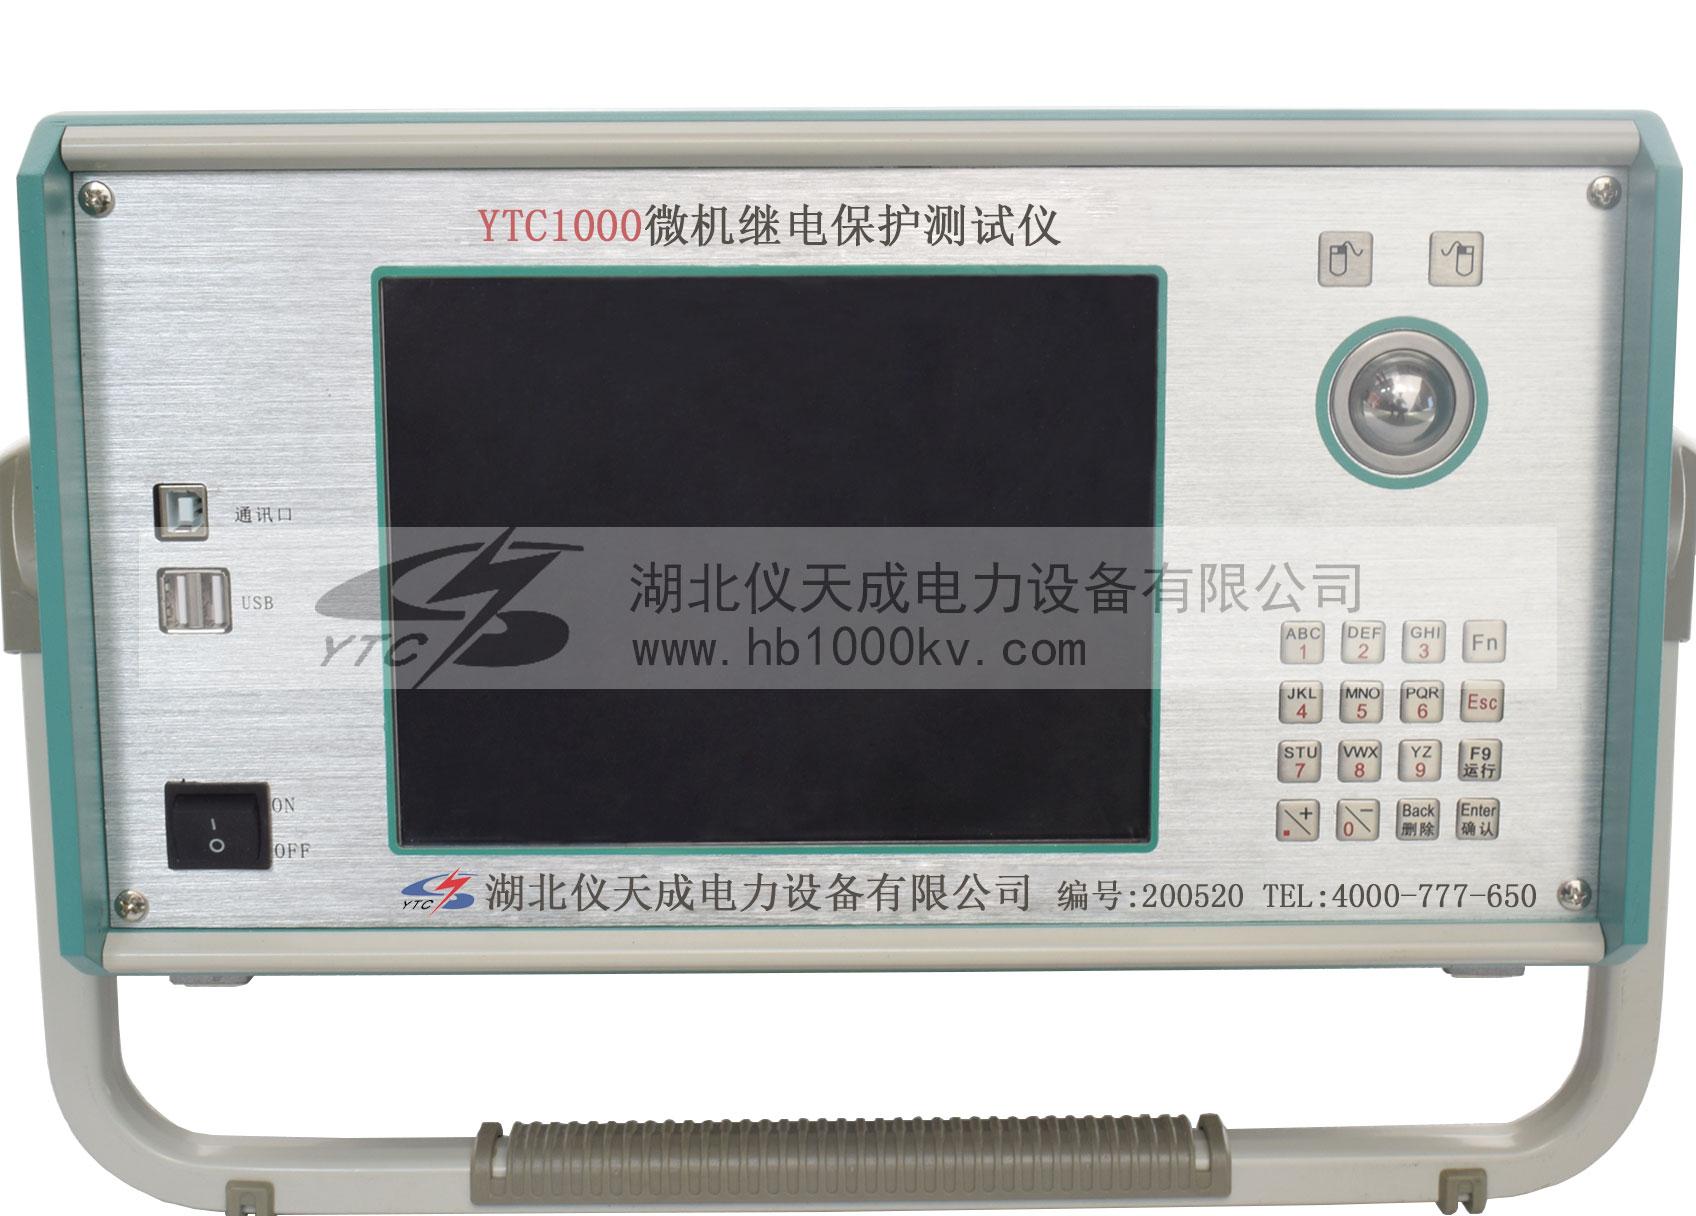 YTC1000微機繼電保護測試儀控制面板